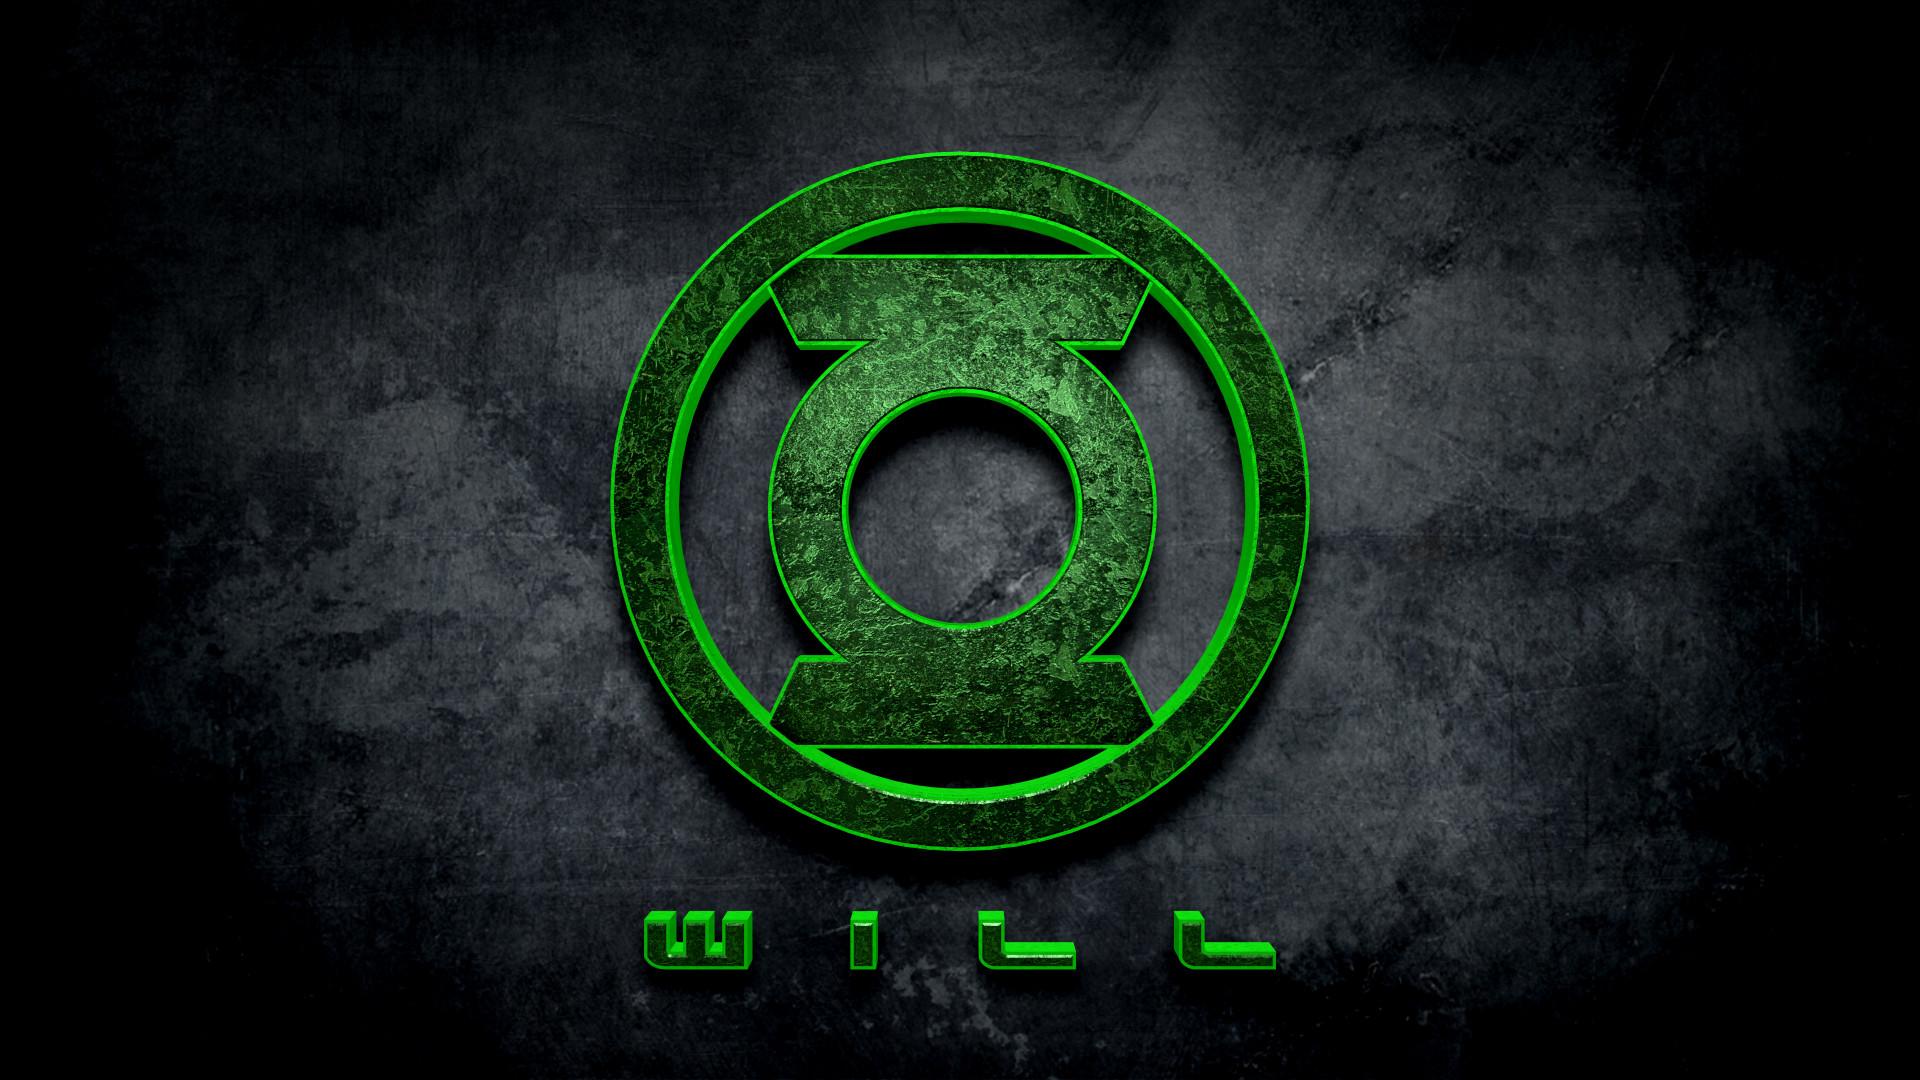 green lantern logo wallpaper. Black Bedroom Furniture Sets. Home Design Ideas